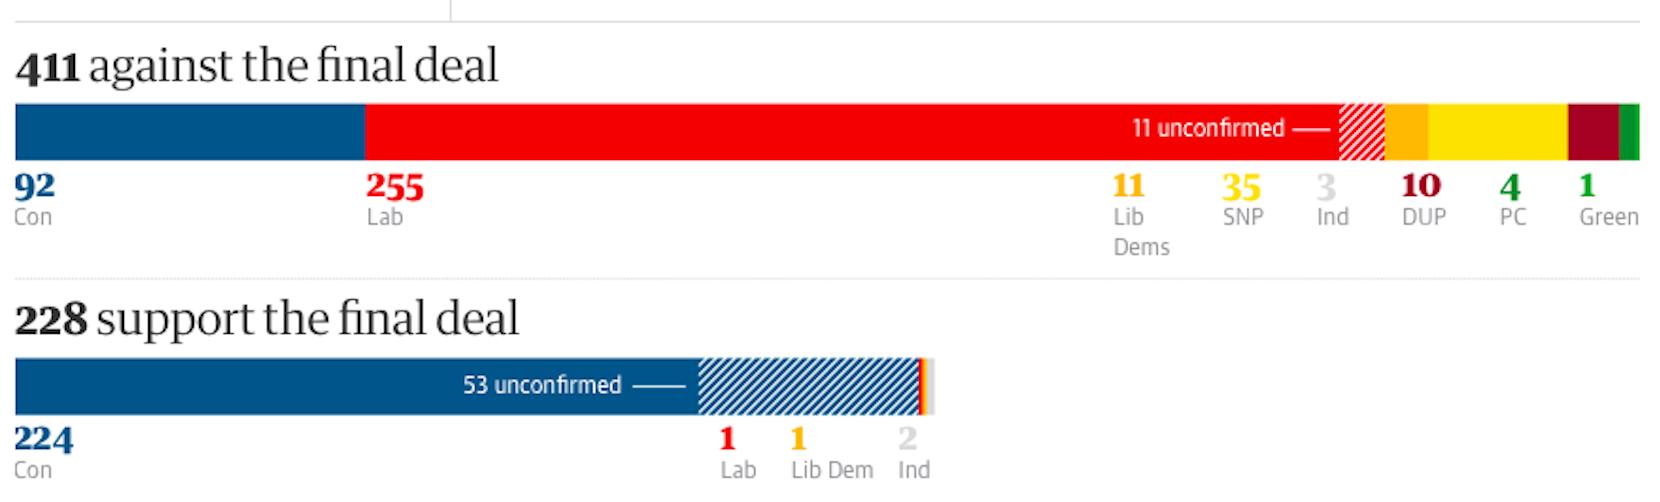 vote brexit parlemantaires